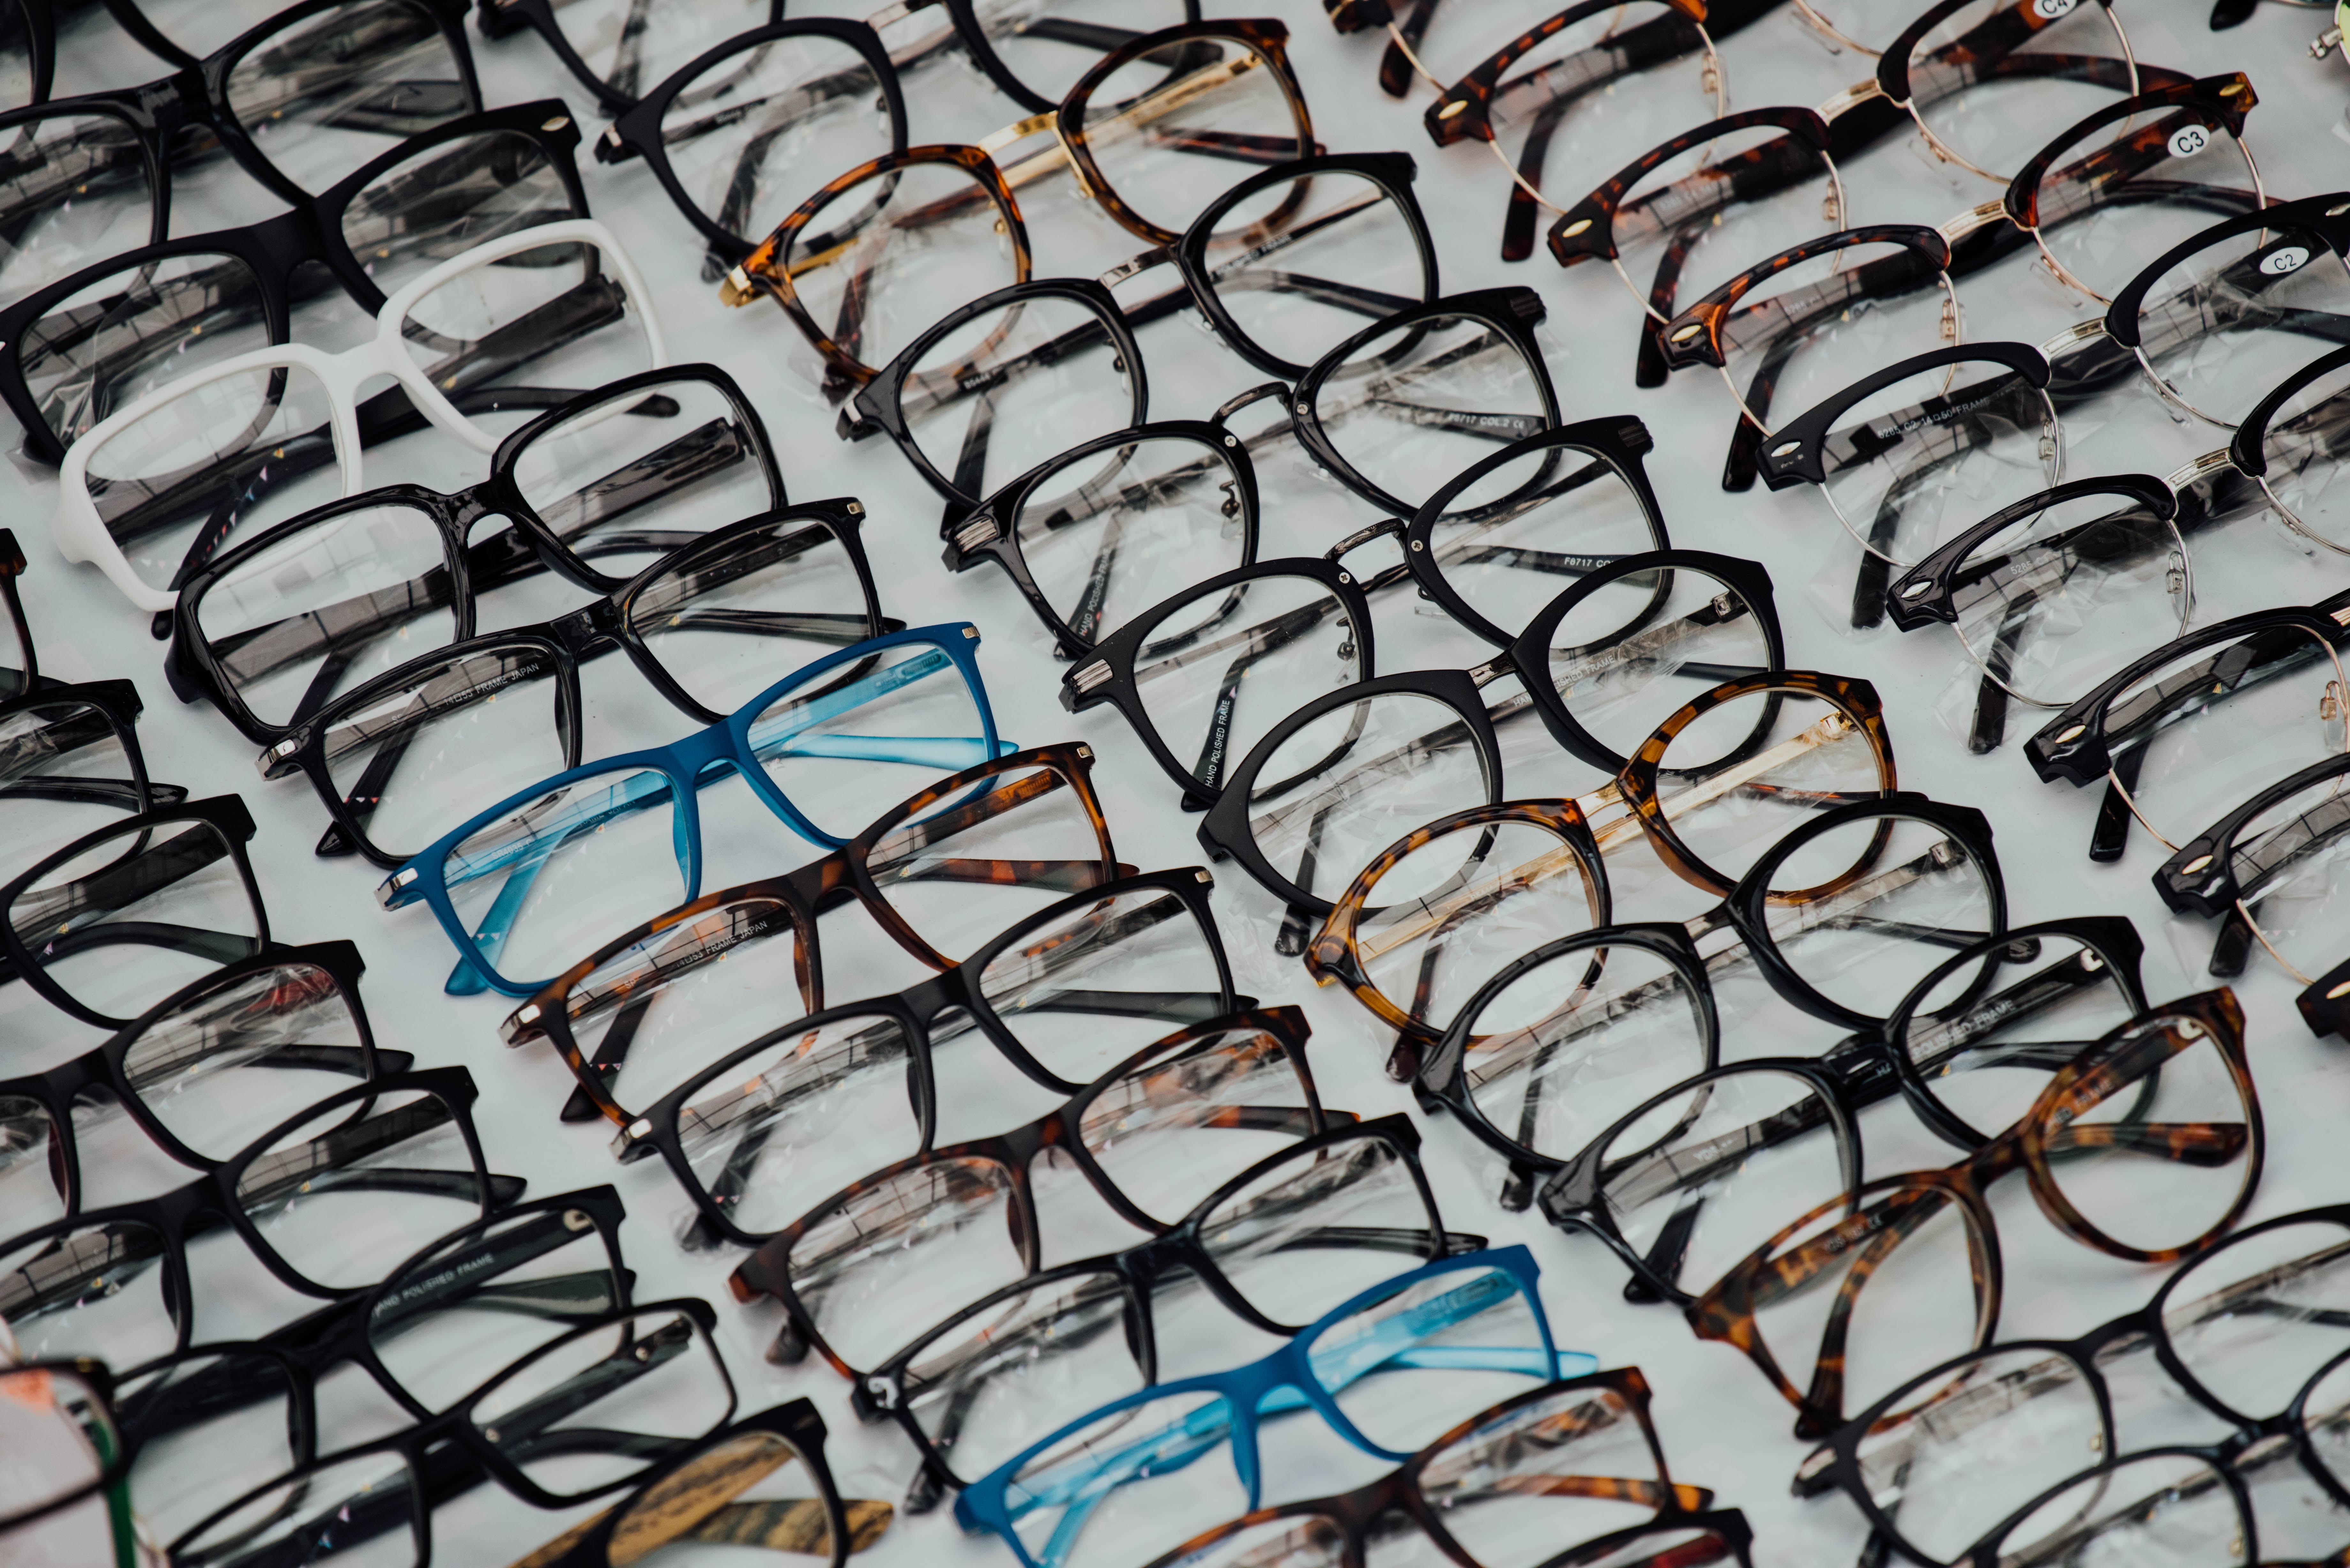 eyeglasses lot